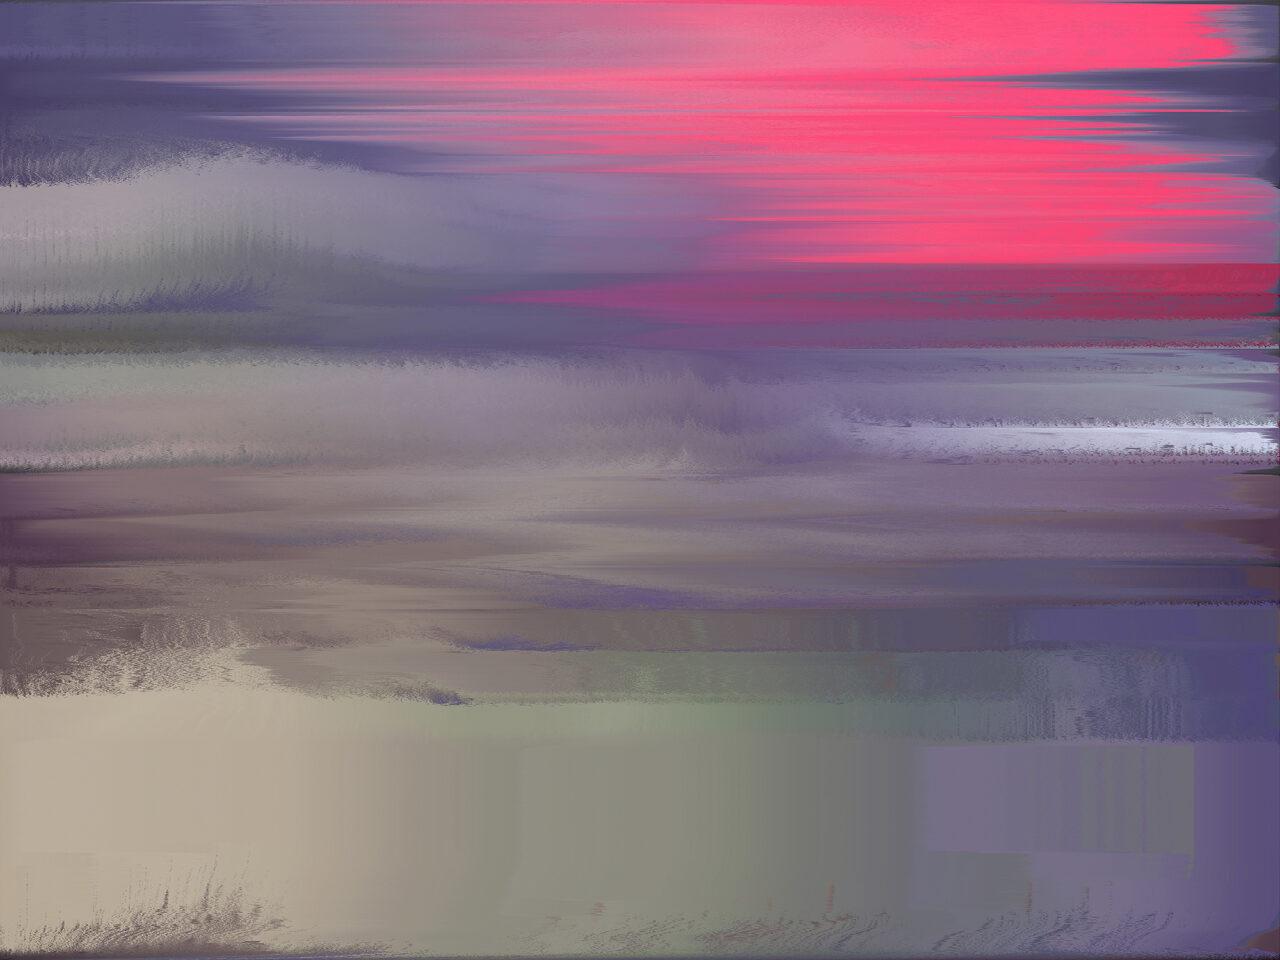 Abendrot, 2021, Experimental Fine Art Photography, Mixed Media, 56 cmx 75 cm, Farbpigment auf Aludibond mit Schattenfuge, rückseitig signiert